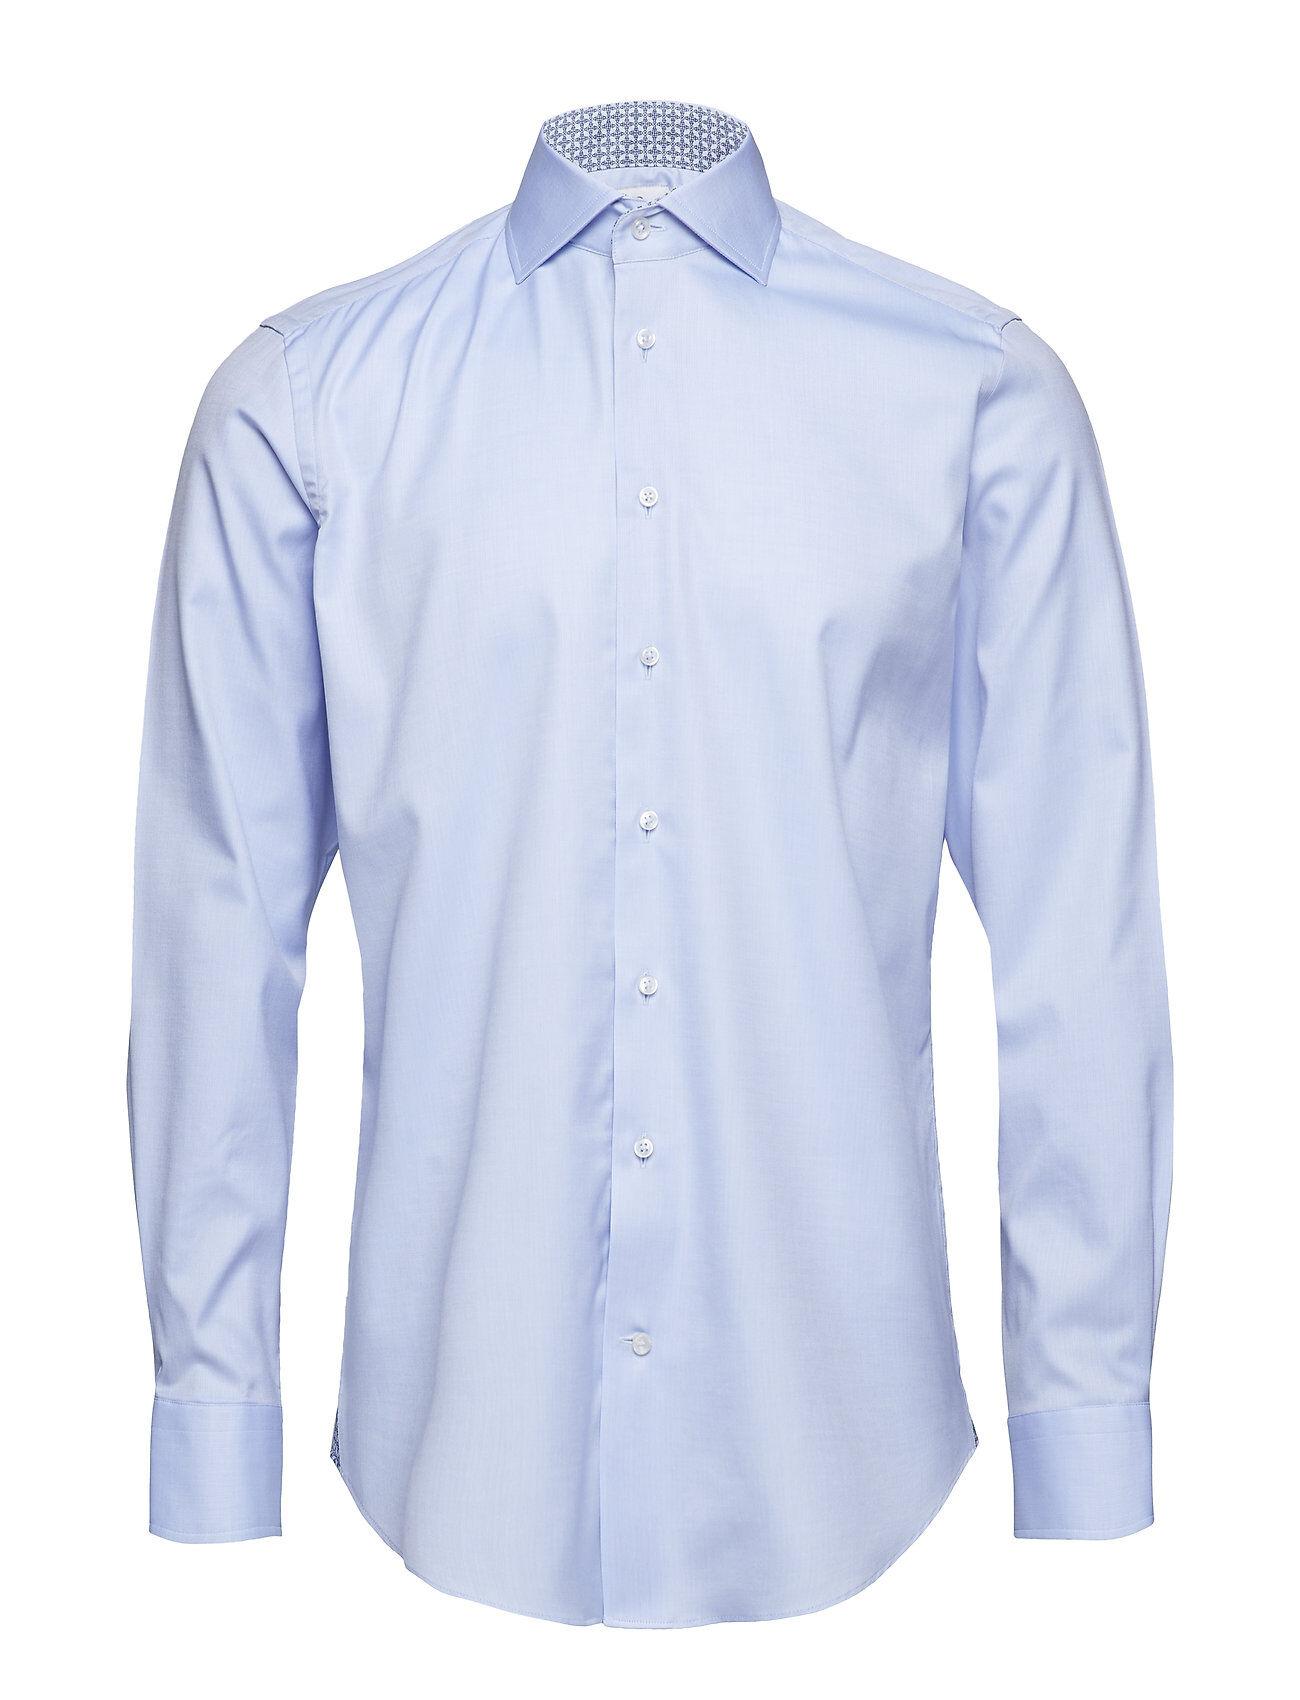 XO Shirtmaker by Sand Copenhagen 8081 Details - Gordon Fc